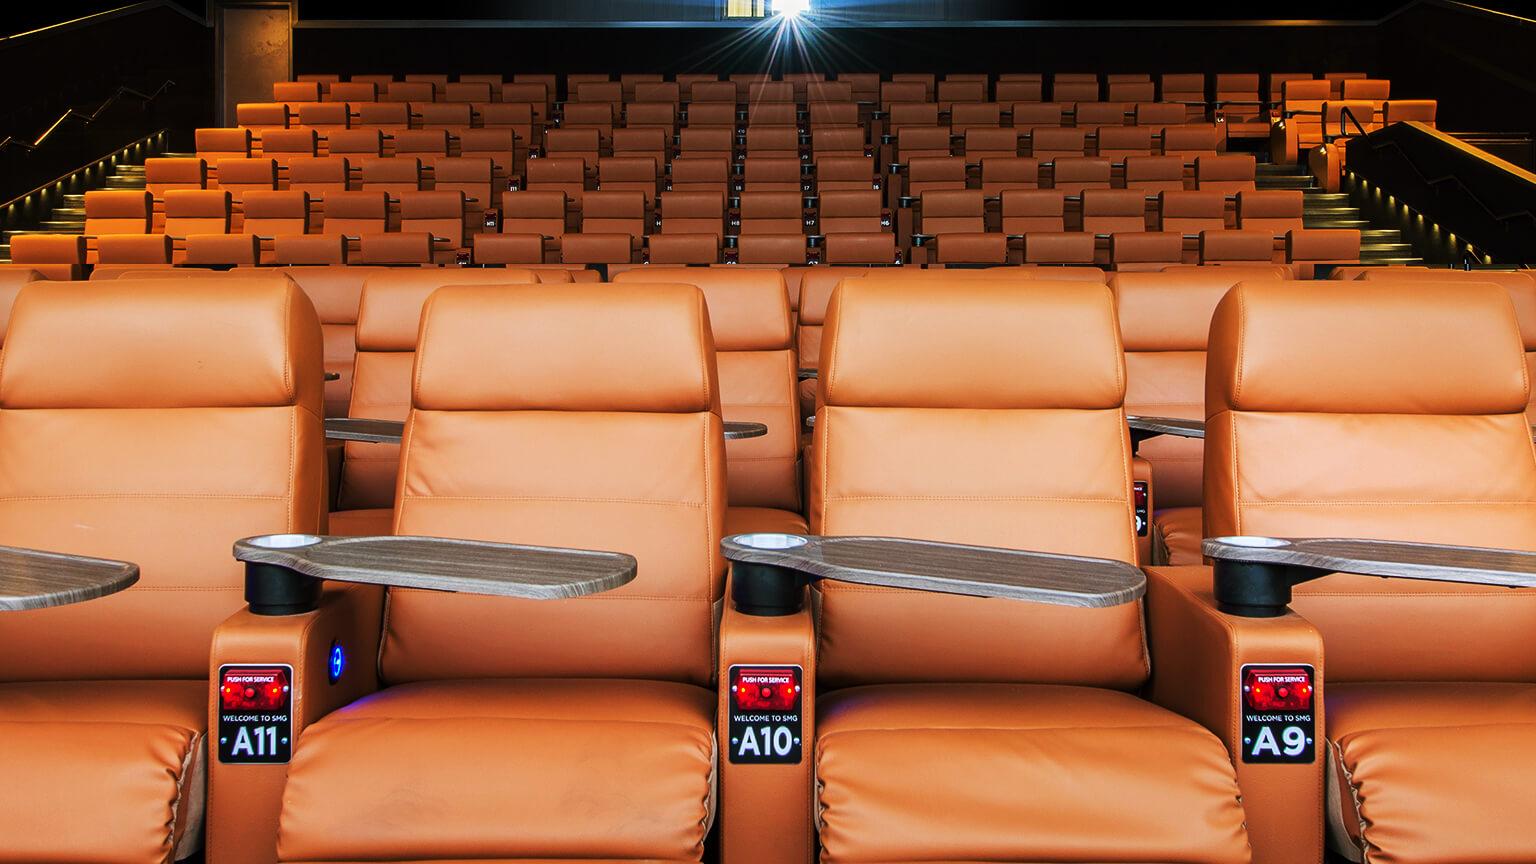 Royal Lane, Dallas, TX Movie Theater | Studio Movie Grill